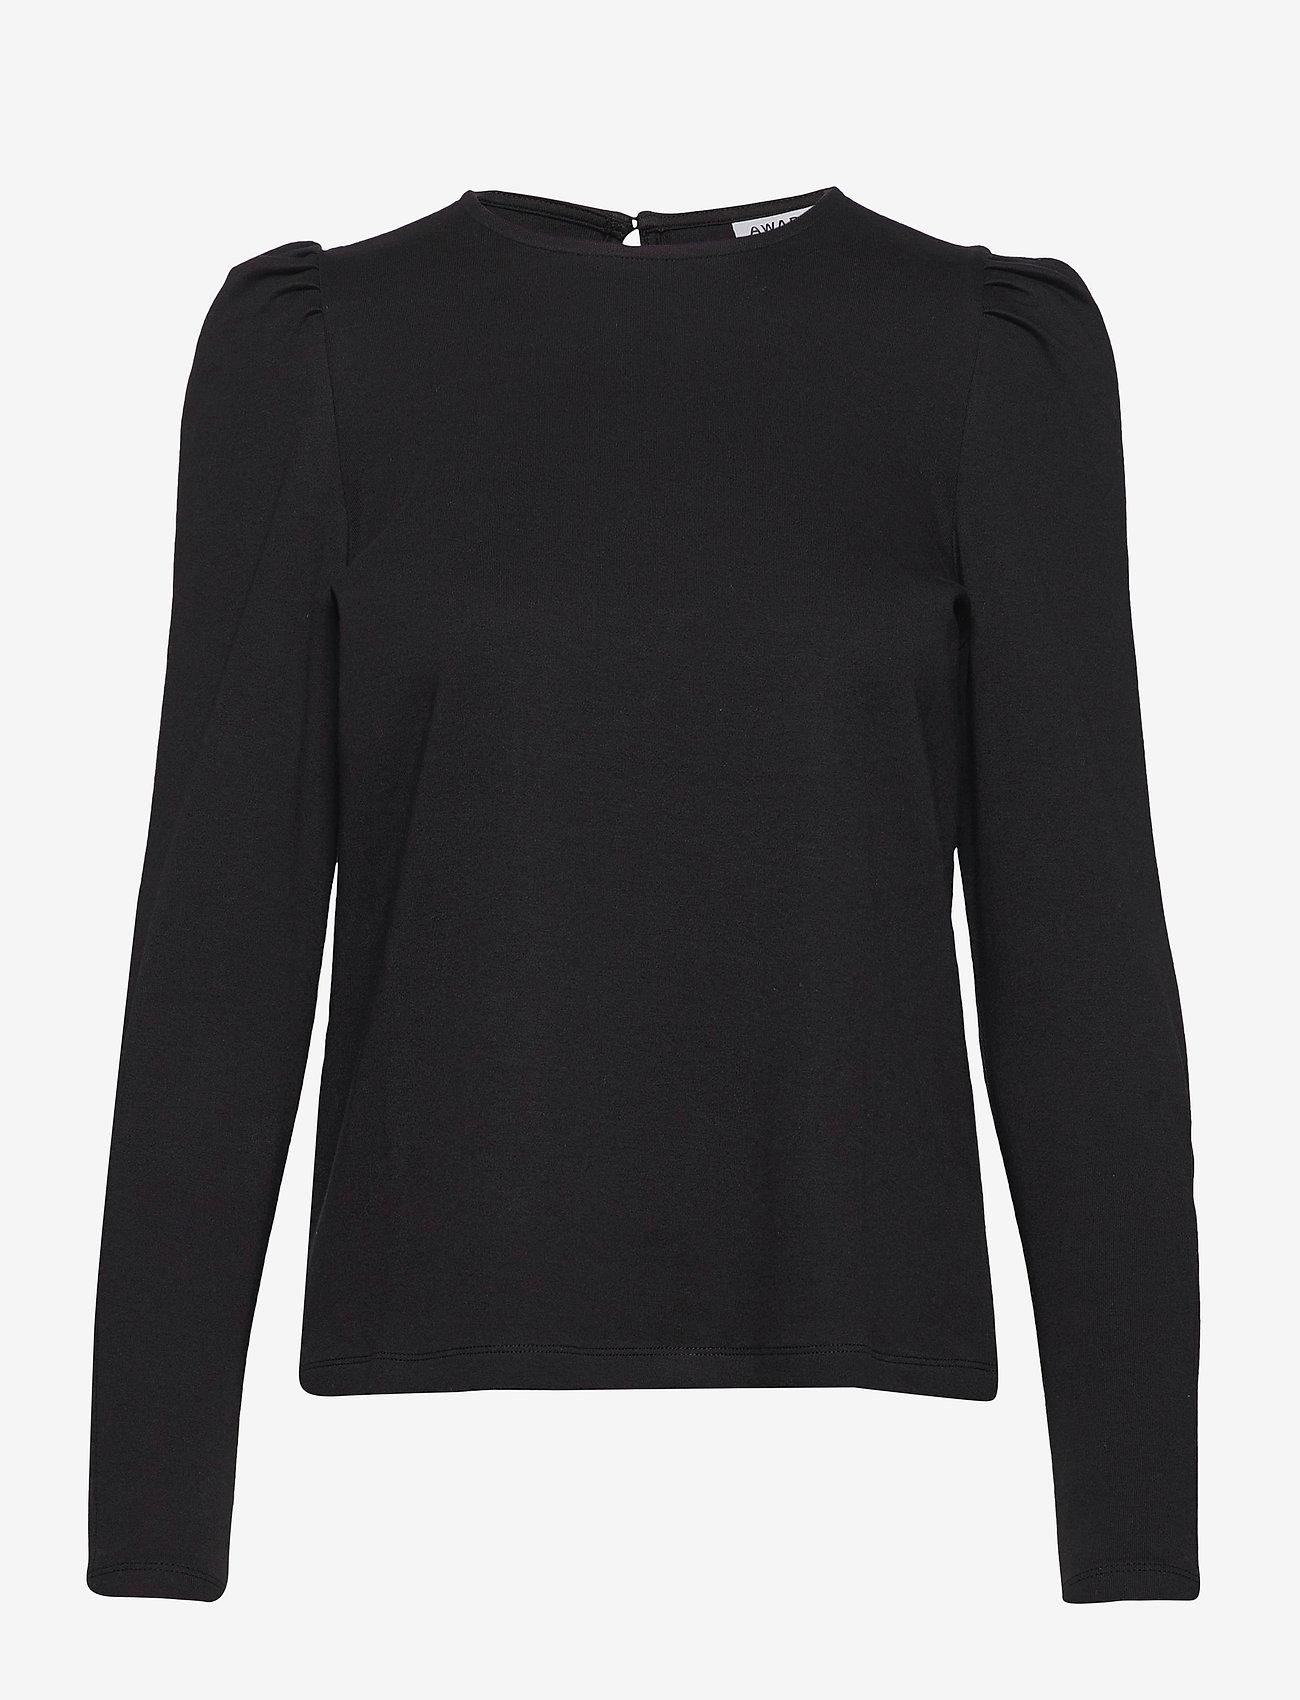 Vero Moda - VMNOREEN LS O-NECK BLOUSE VMA - långärmade blusar - black - 0